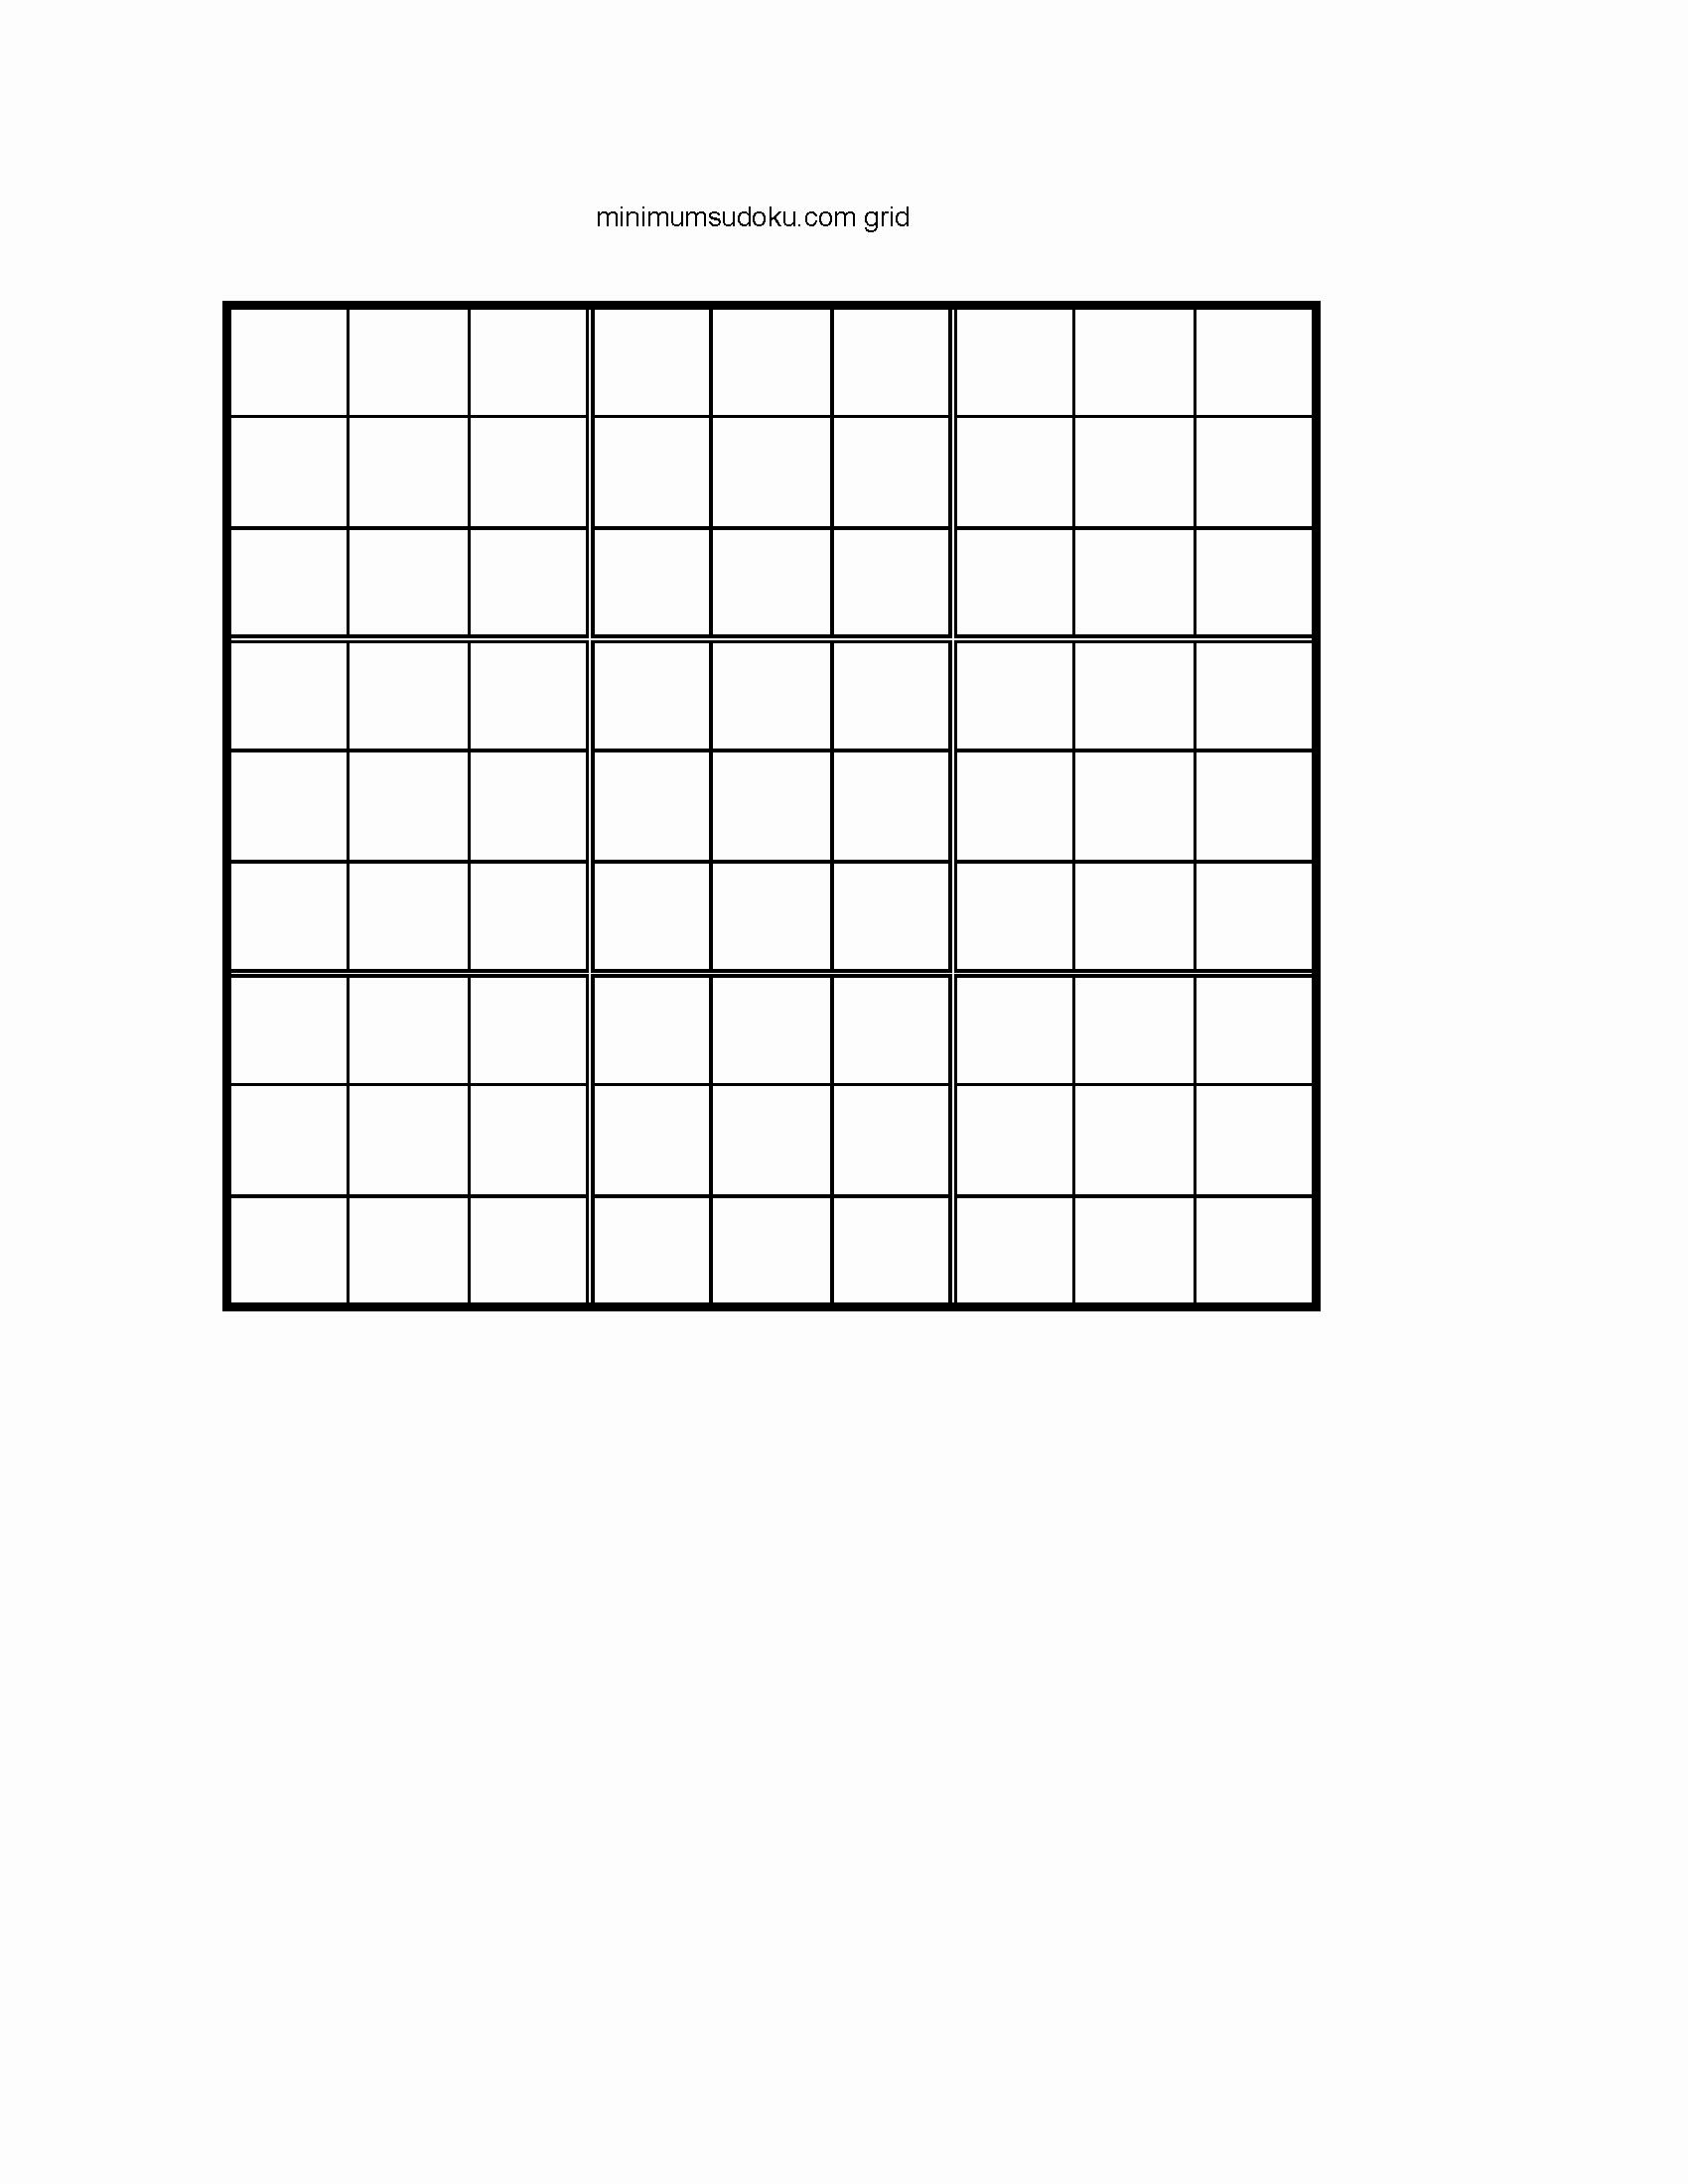 Blank Sudoku Grid Printable New Minimum Sudoku